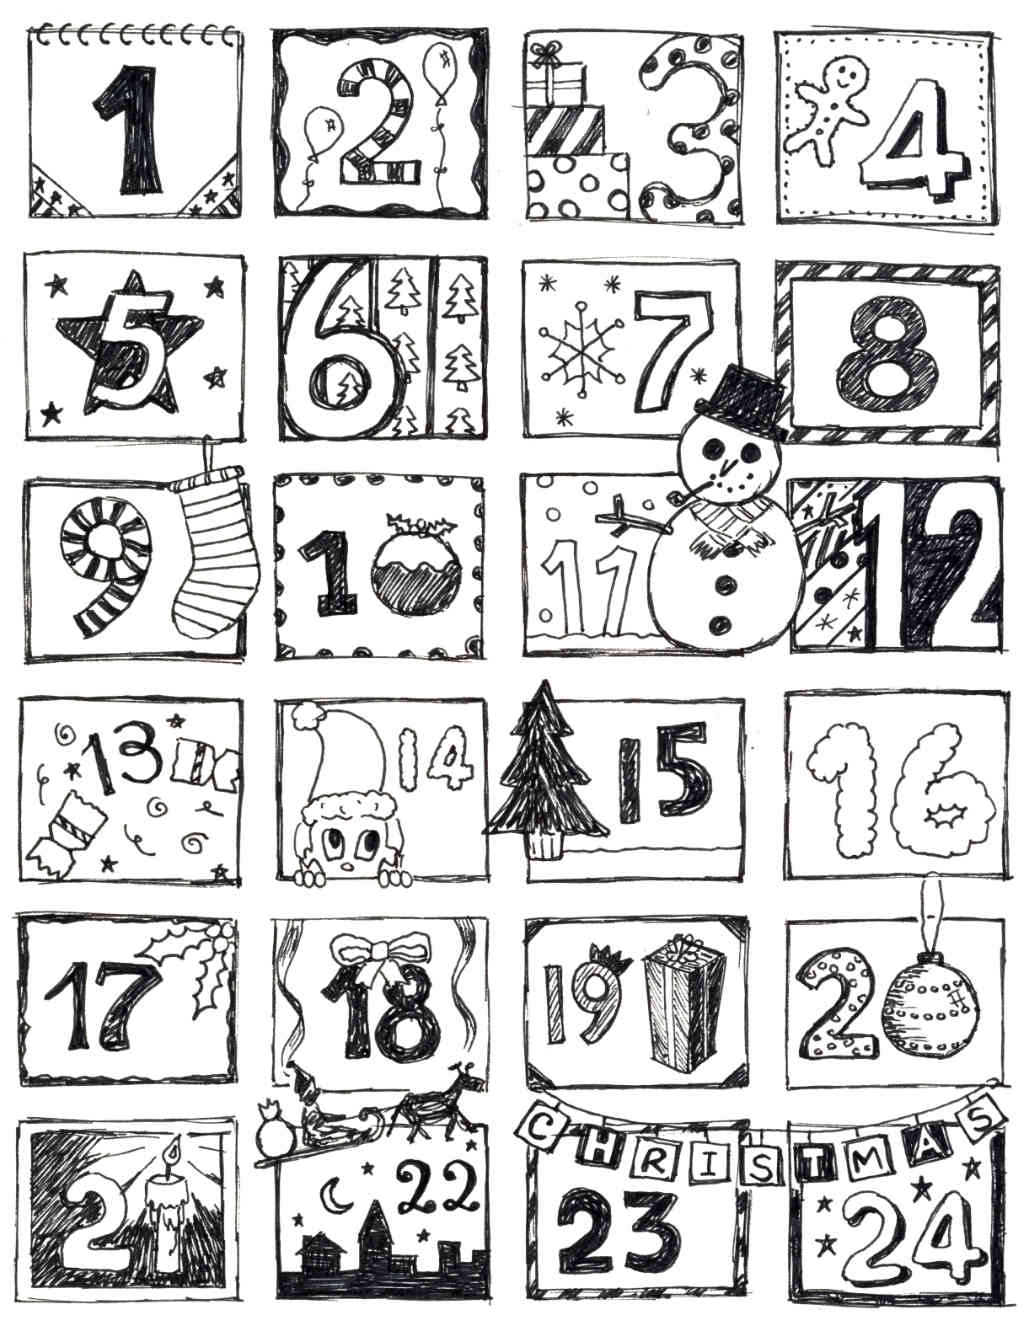 coloring pages advent calendar coloring home. Black Bedroom Furniture Sets. Home Design Ideas